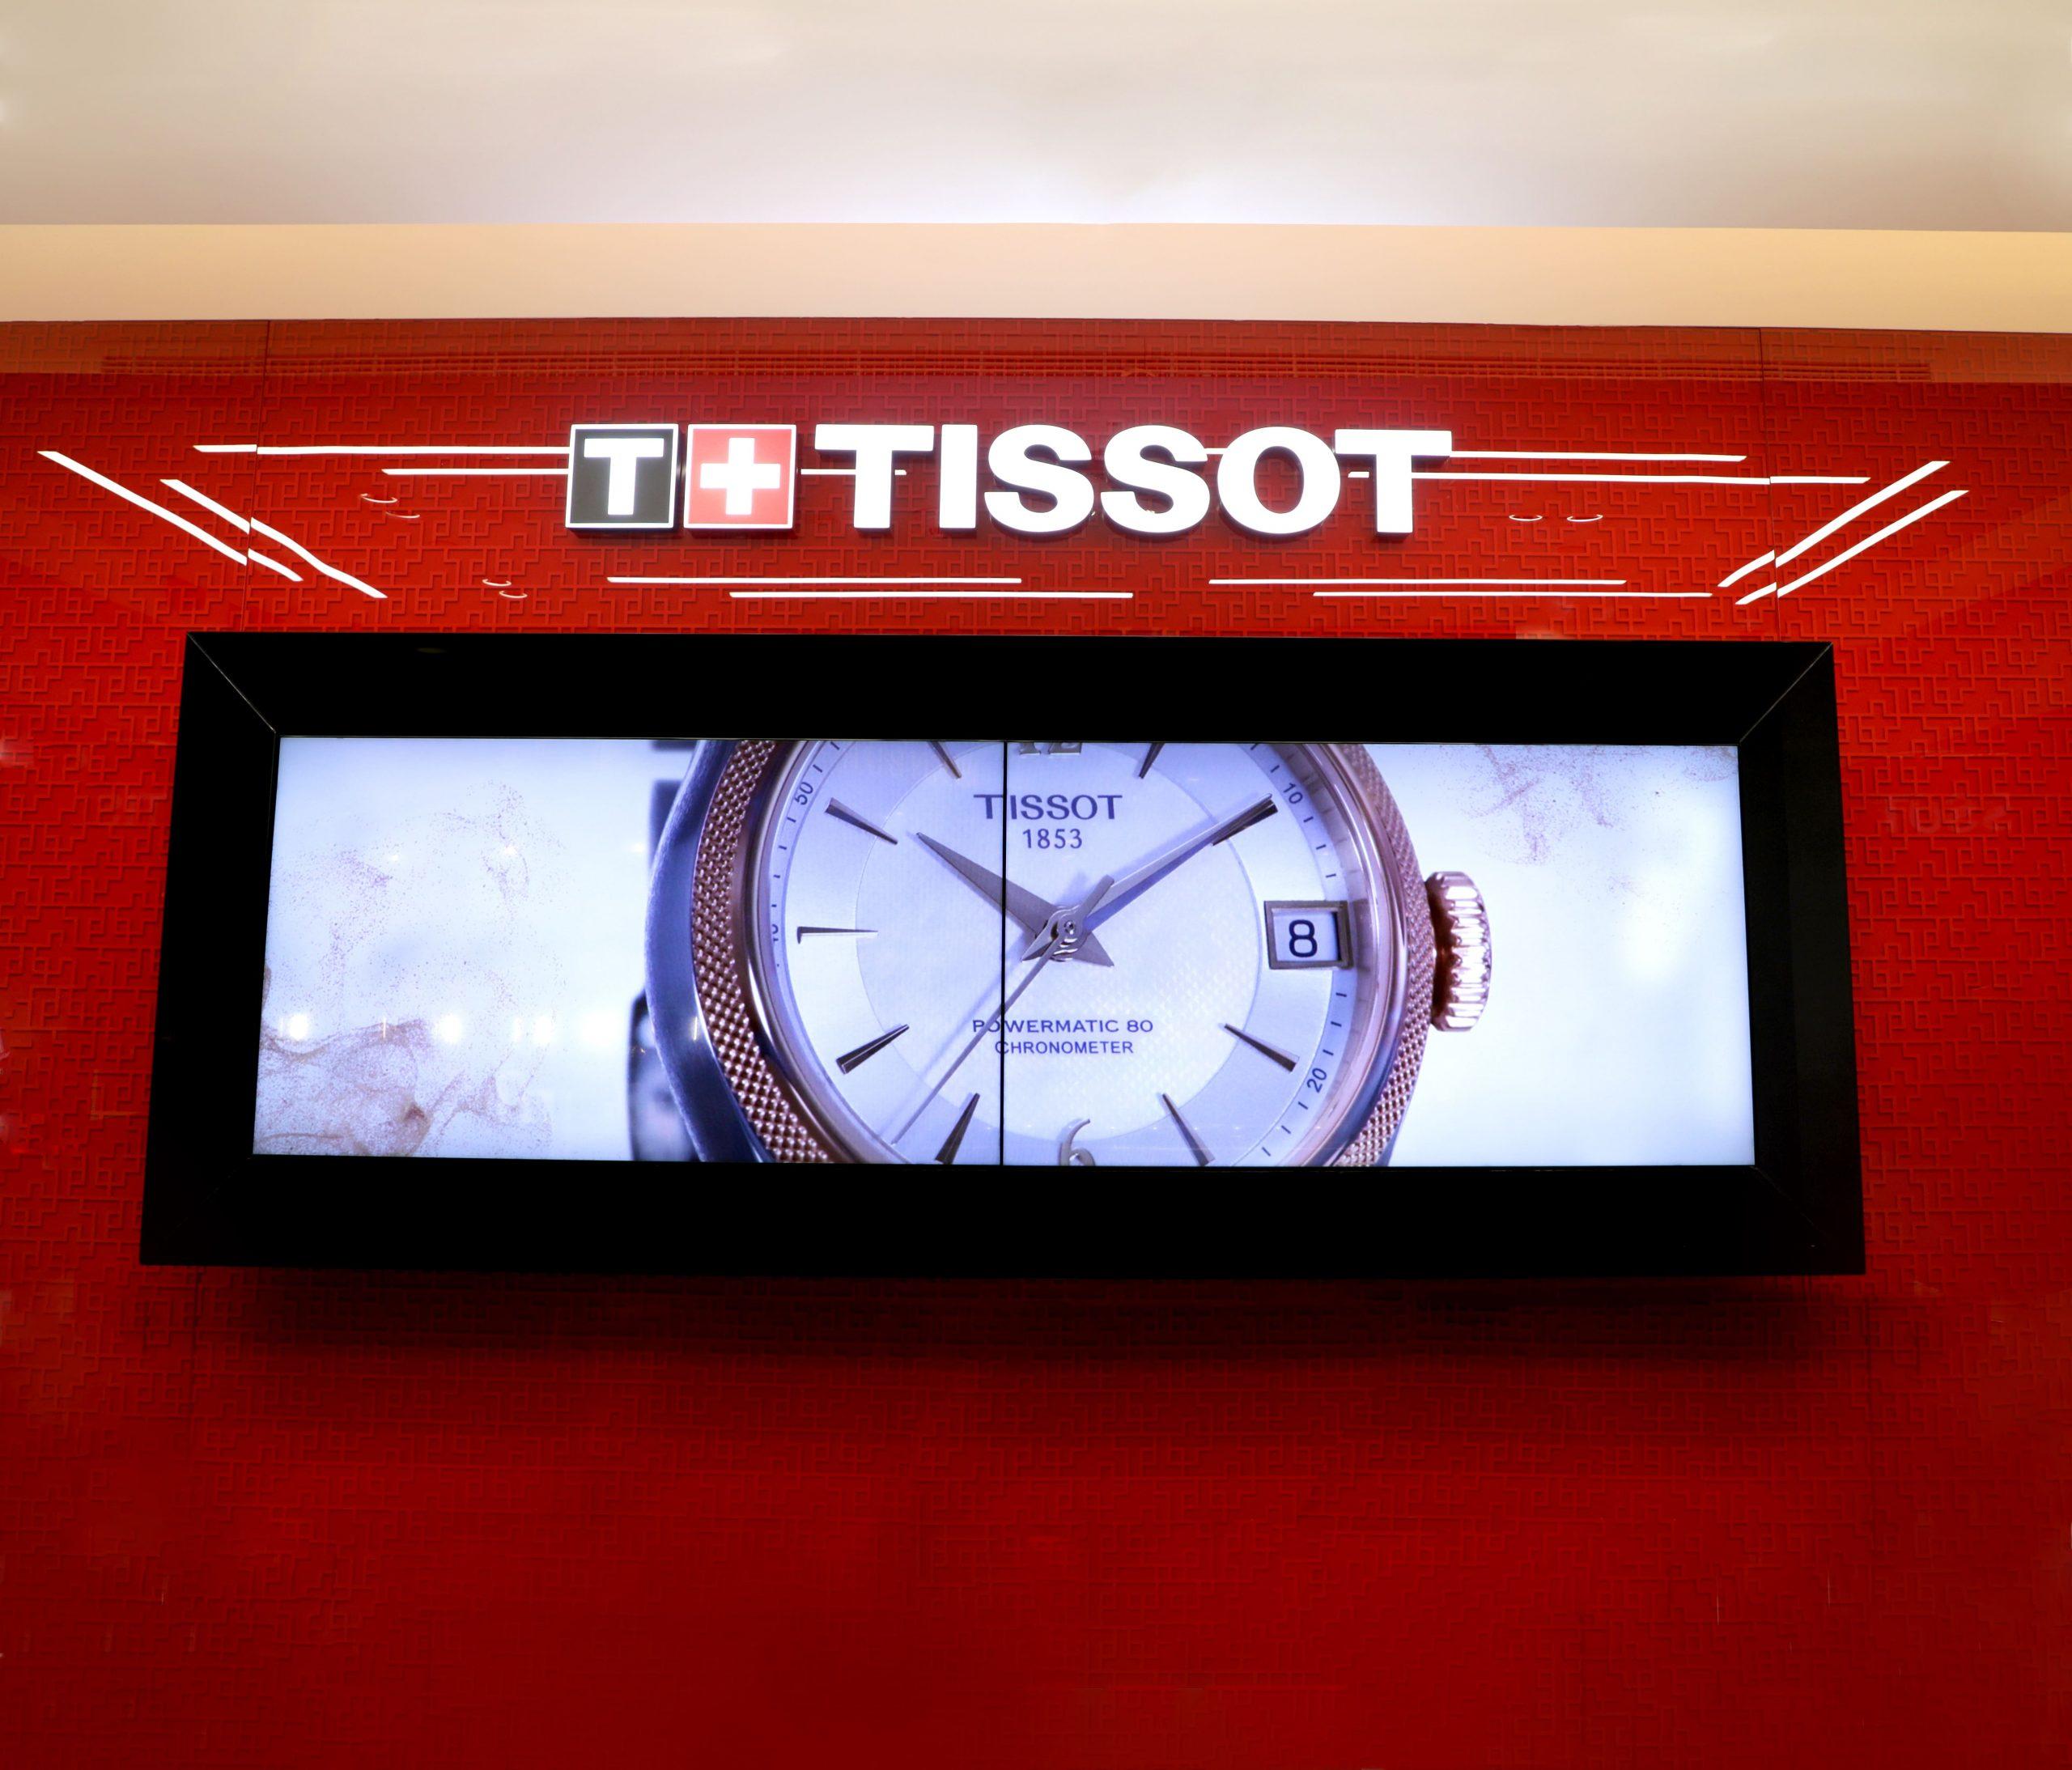 Tissot Display Screen UAE